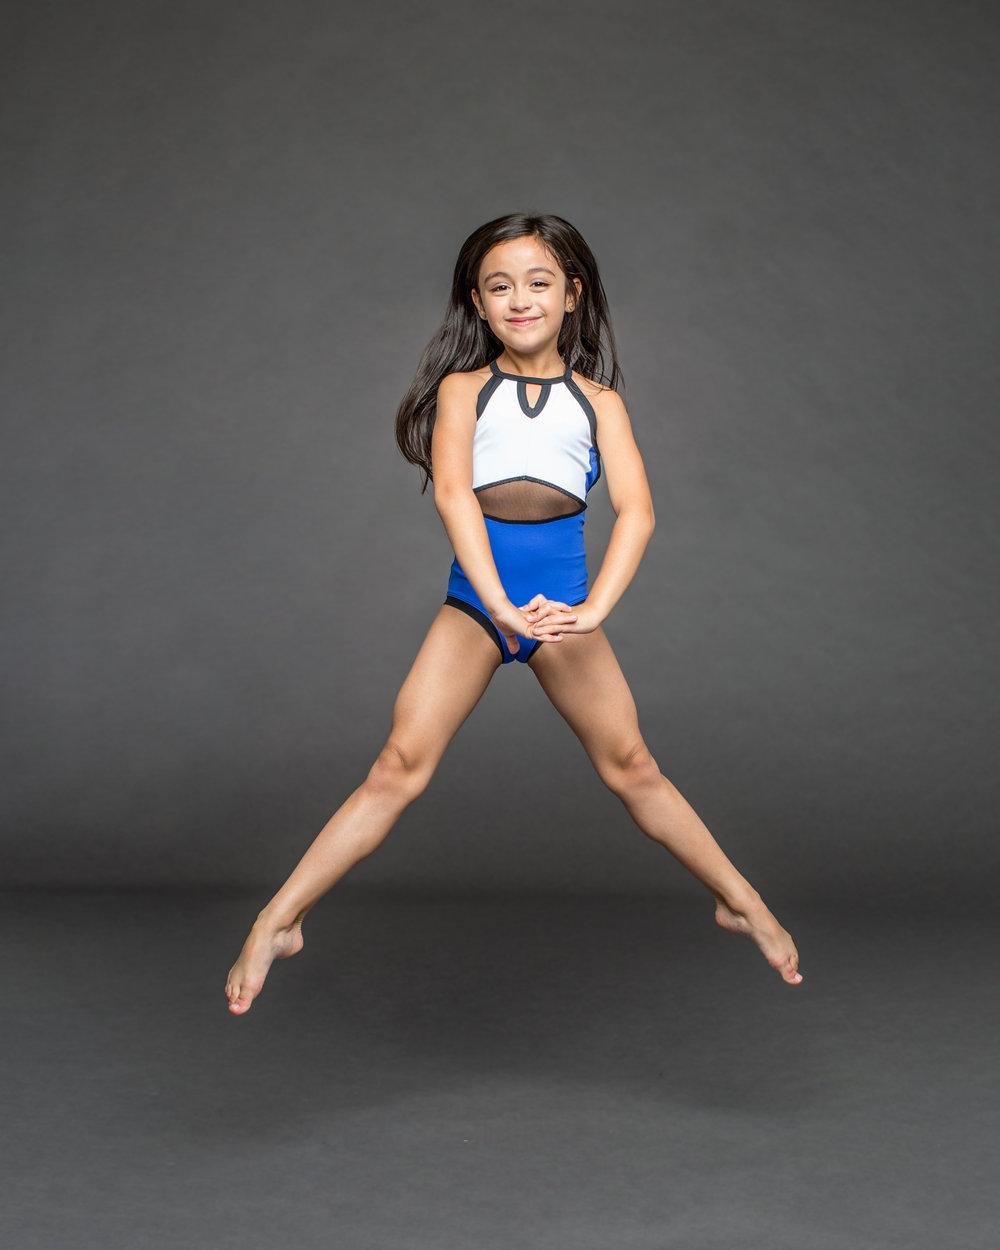 Melissa Lawler Jump.jpg